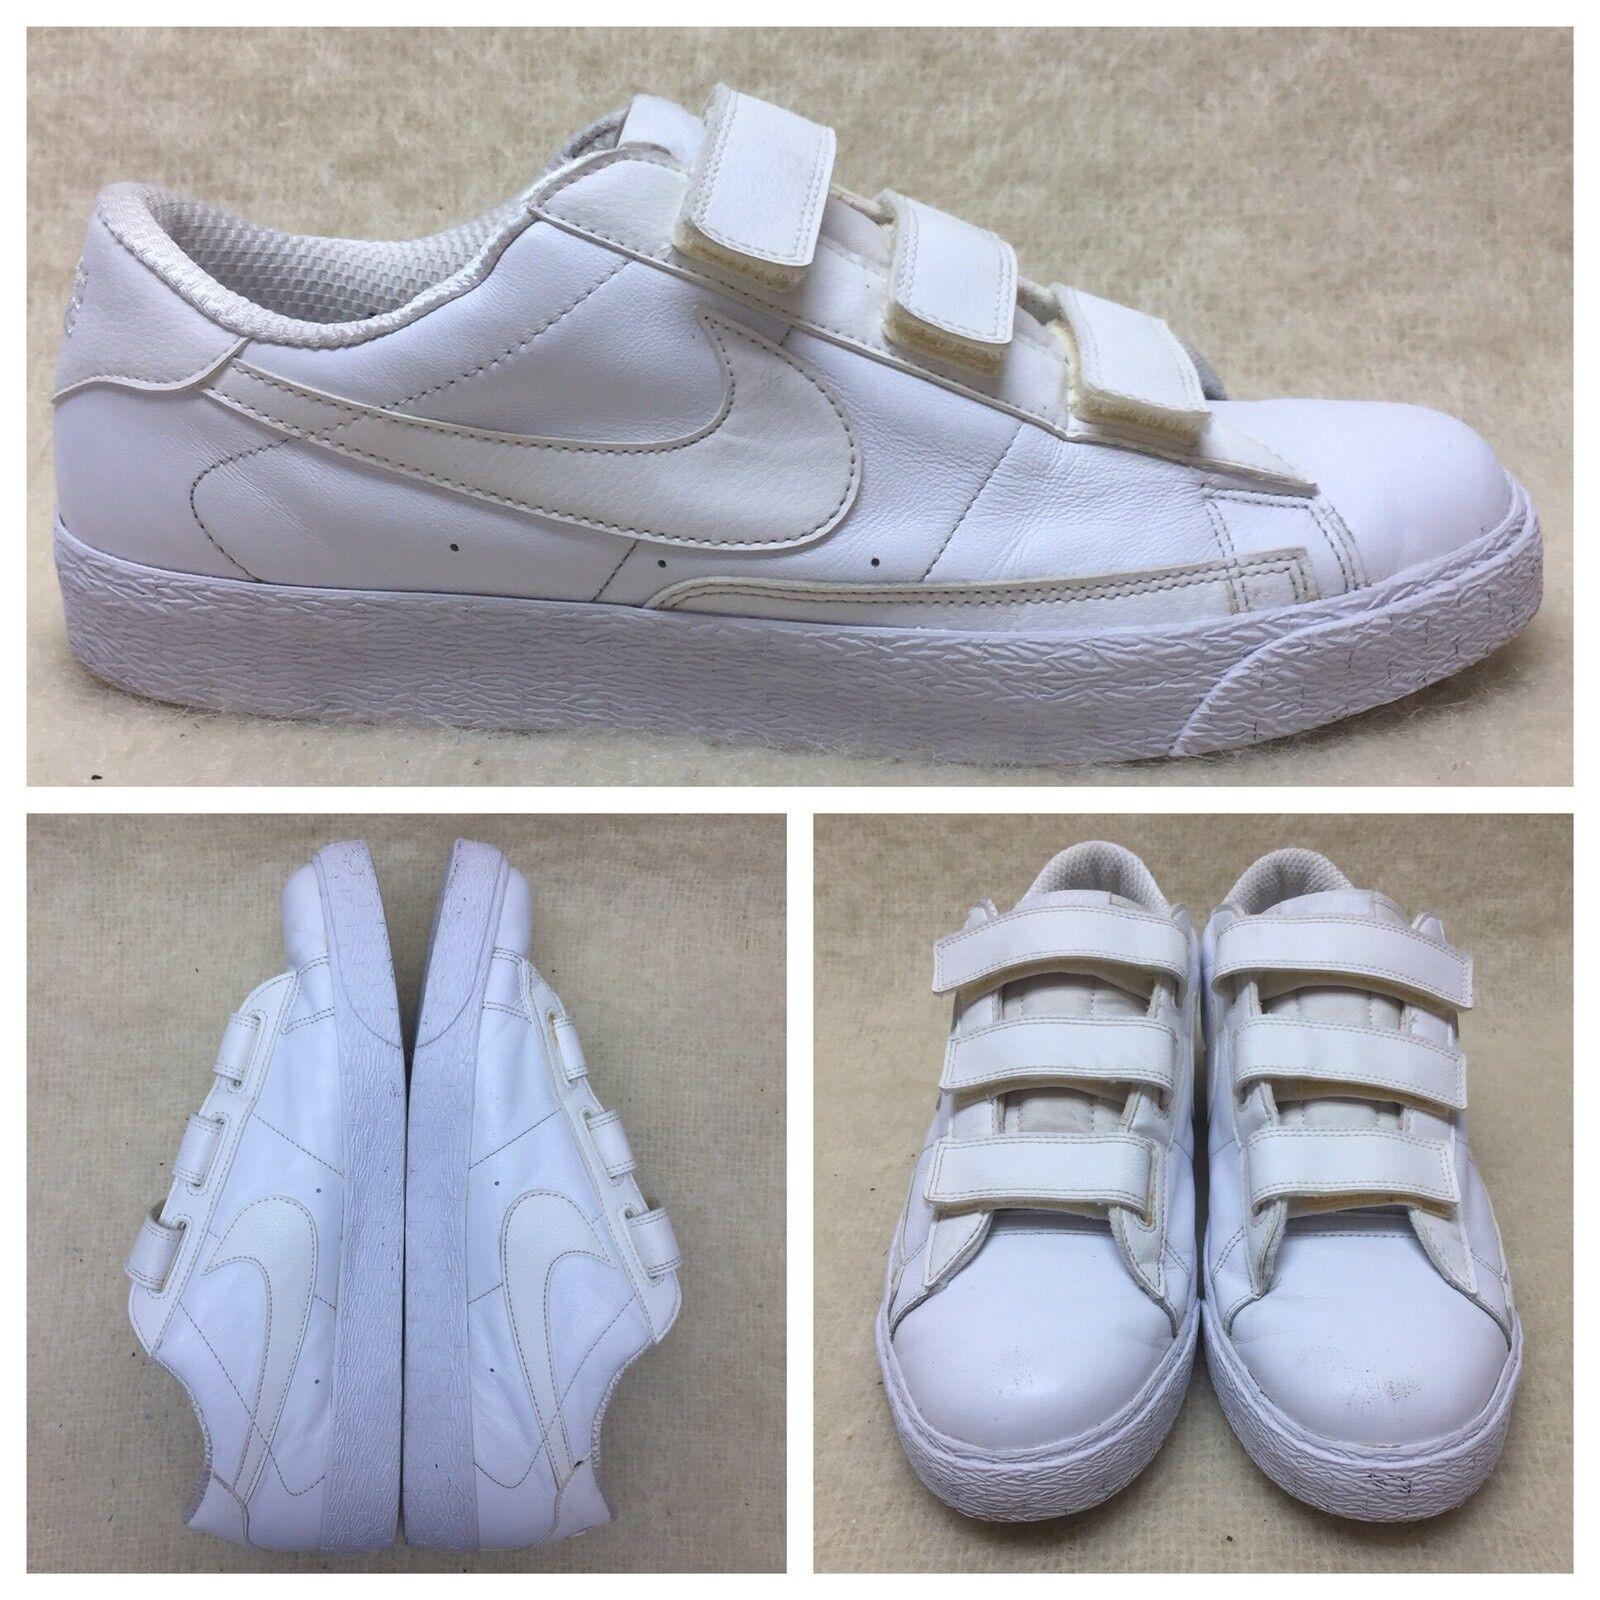 Nike 347637-100 white mens size 12 no tie adjustable stick straps Seasonal clearance sale